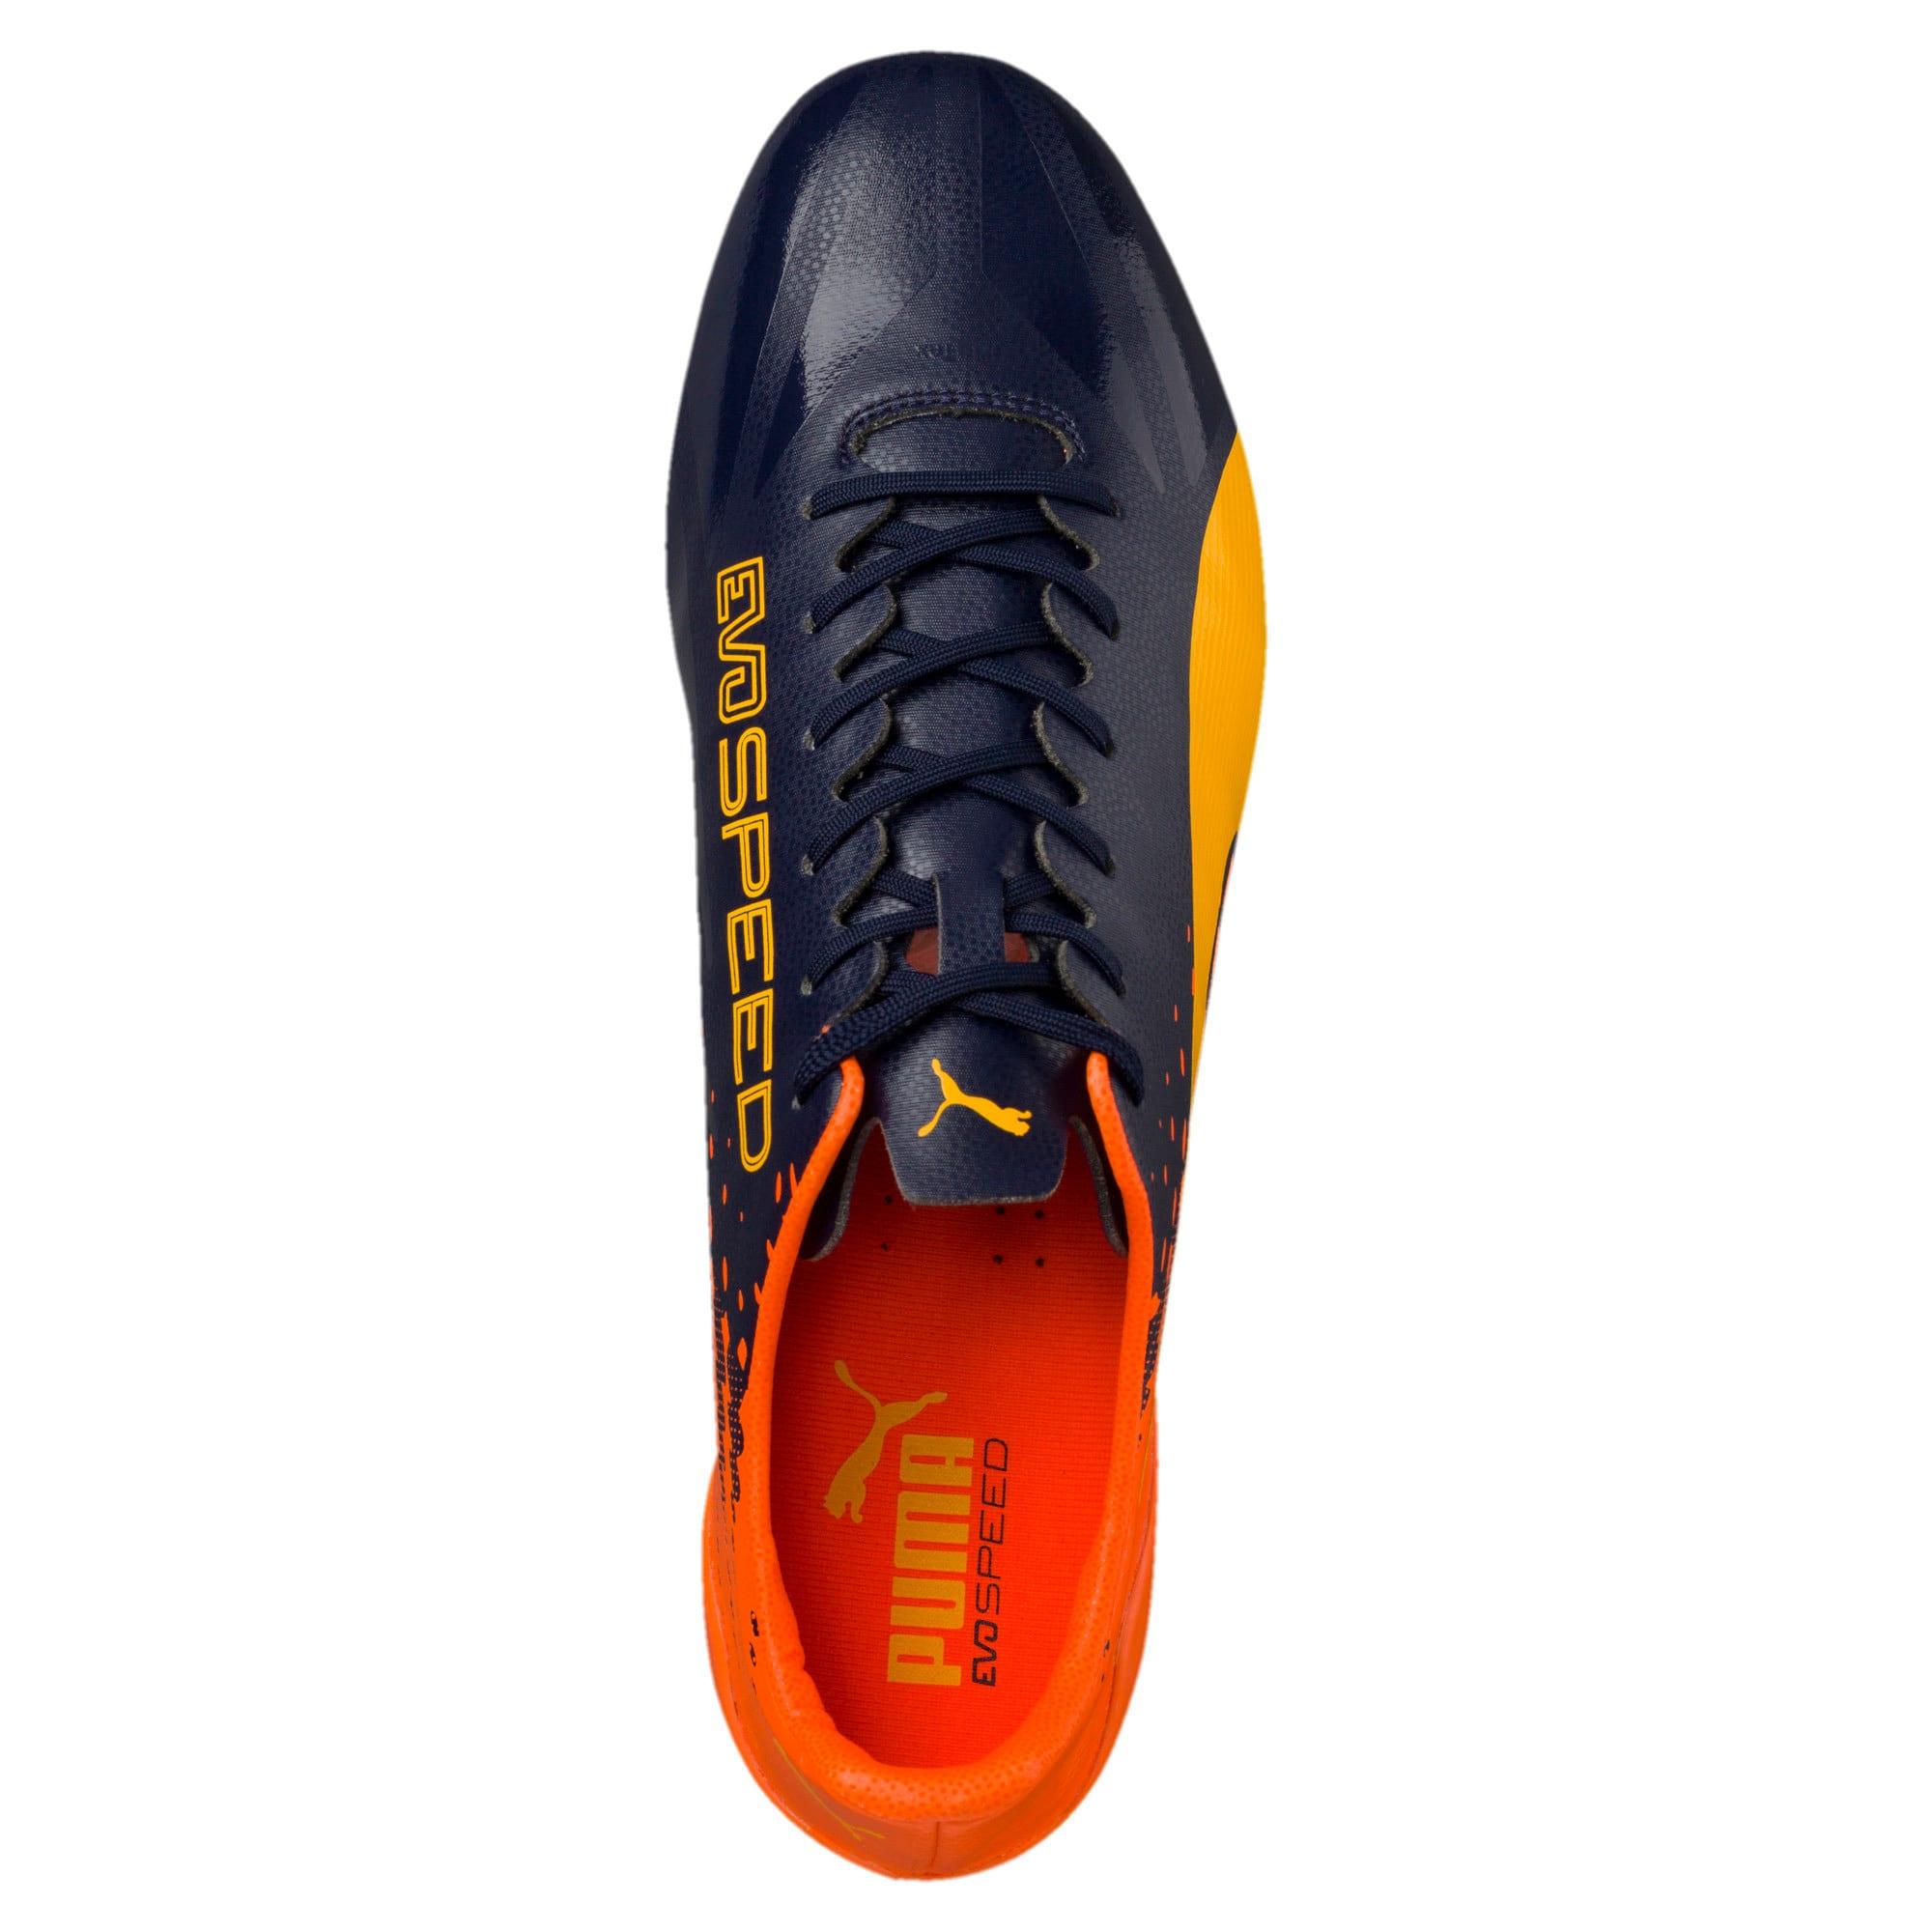 Thumbnail 6 of evoSPEED 17 SL-S FG Men's Football Boots, YELLOW-Peacoat-Orange, medium-IND